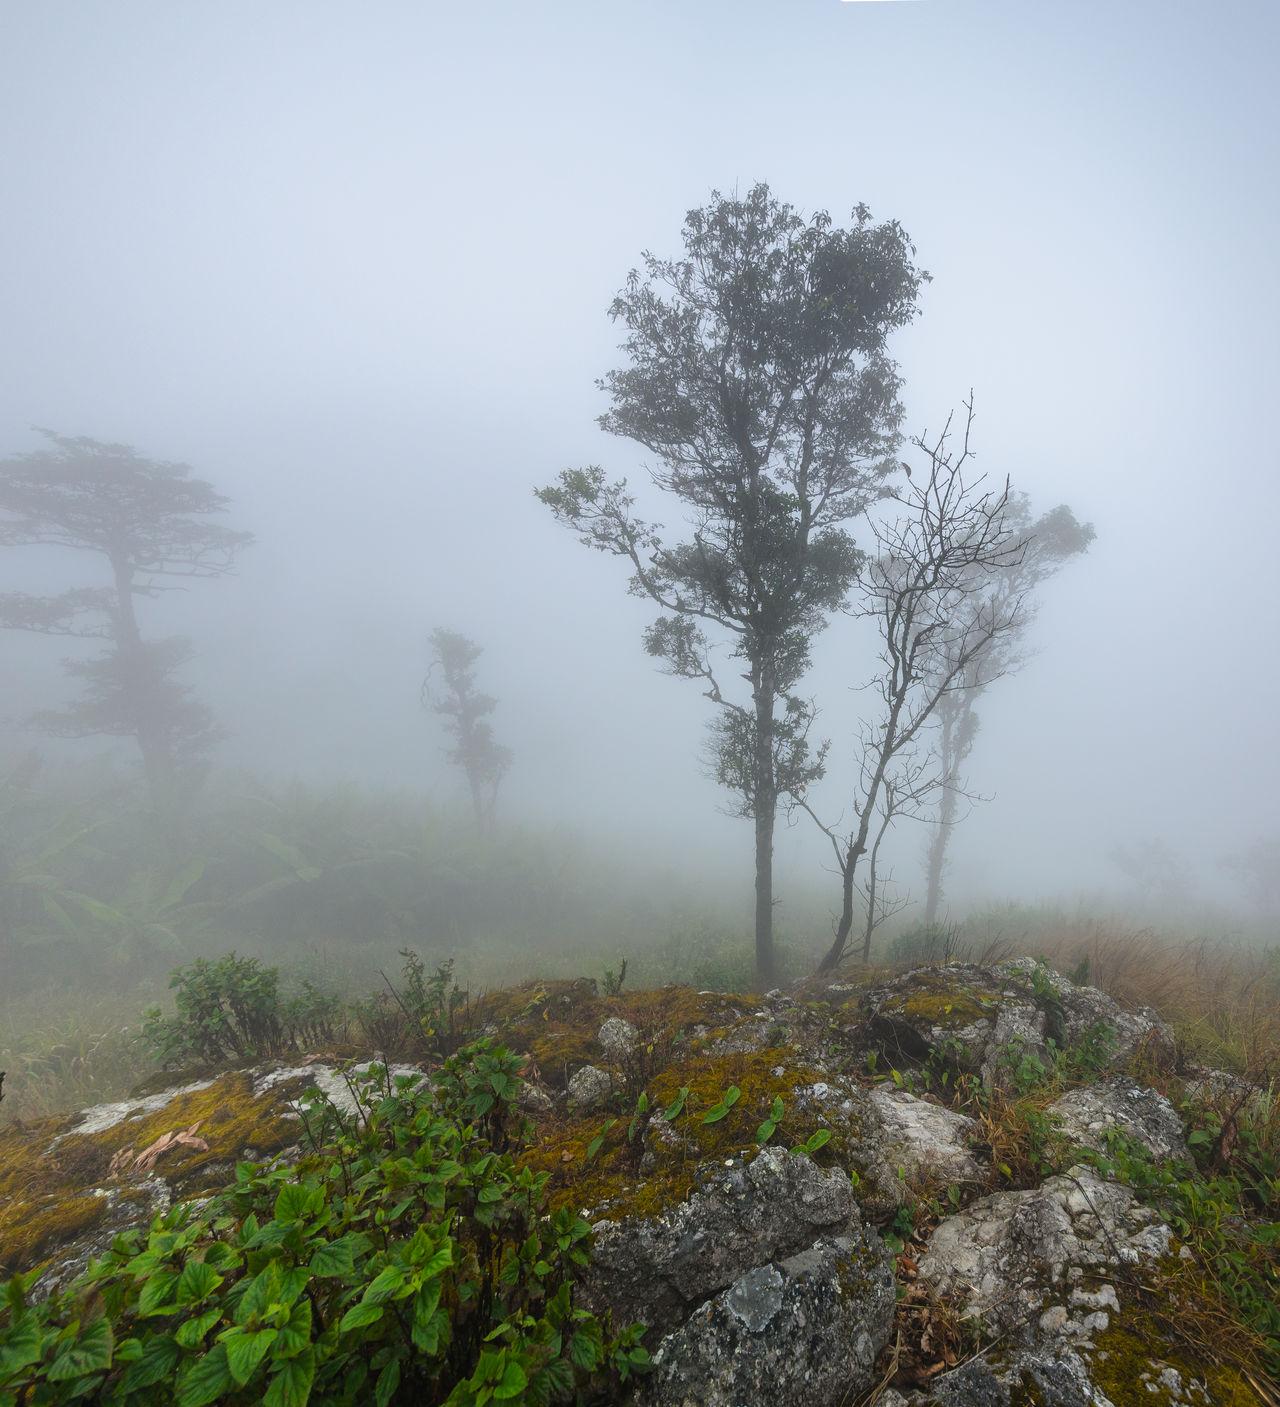 phu langka,thailand Autumn Beautiful Environment Fog Forest Green High Landscape Leaf Mountain National Park Nature Outdoors Peace Phayao Phu Langka PlandeDios Rock - Object Thailand Travel Destinations Tree Unseen Unseen Thailand